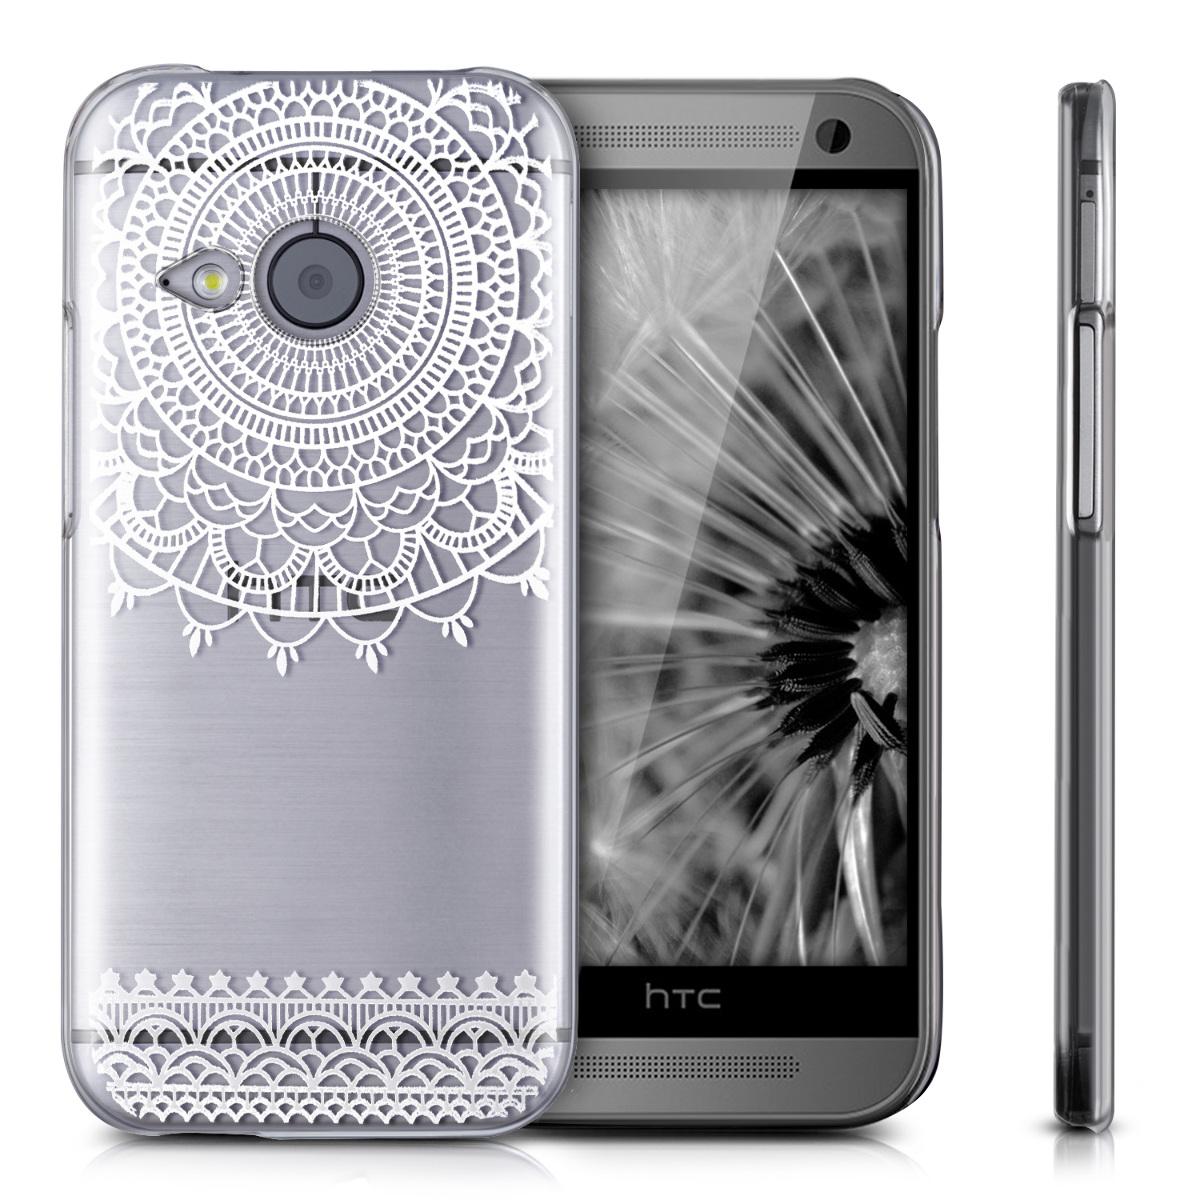 COVER-PER-HTC-ONE-MINI-2-CUSTODIA-BACK-CASE-PER-SMARTPHONE